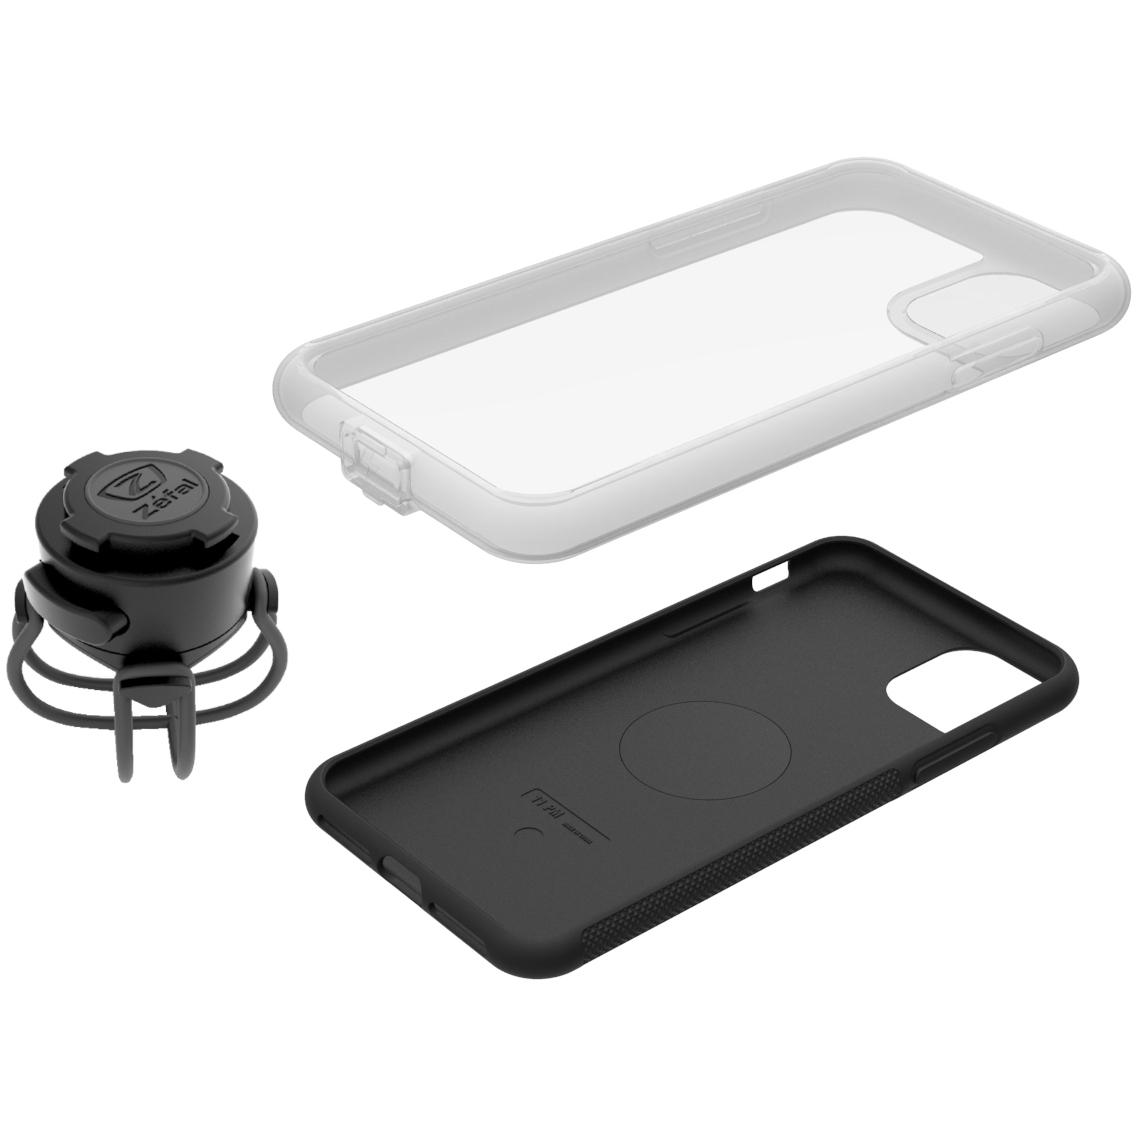 Zéfal Z-Console iPhone 11 Pro Max Bike Kit Smartphone Halter für Z Bike Mount